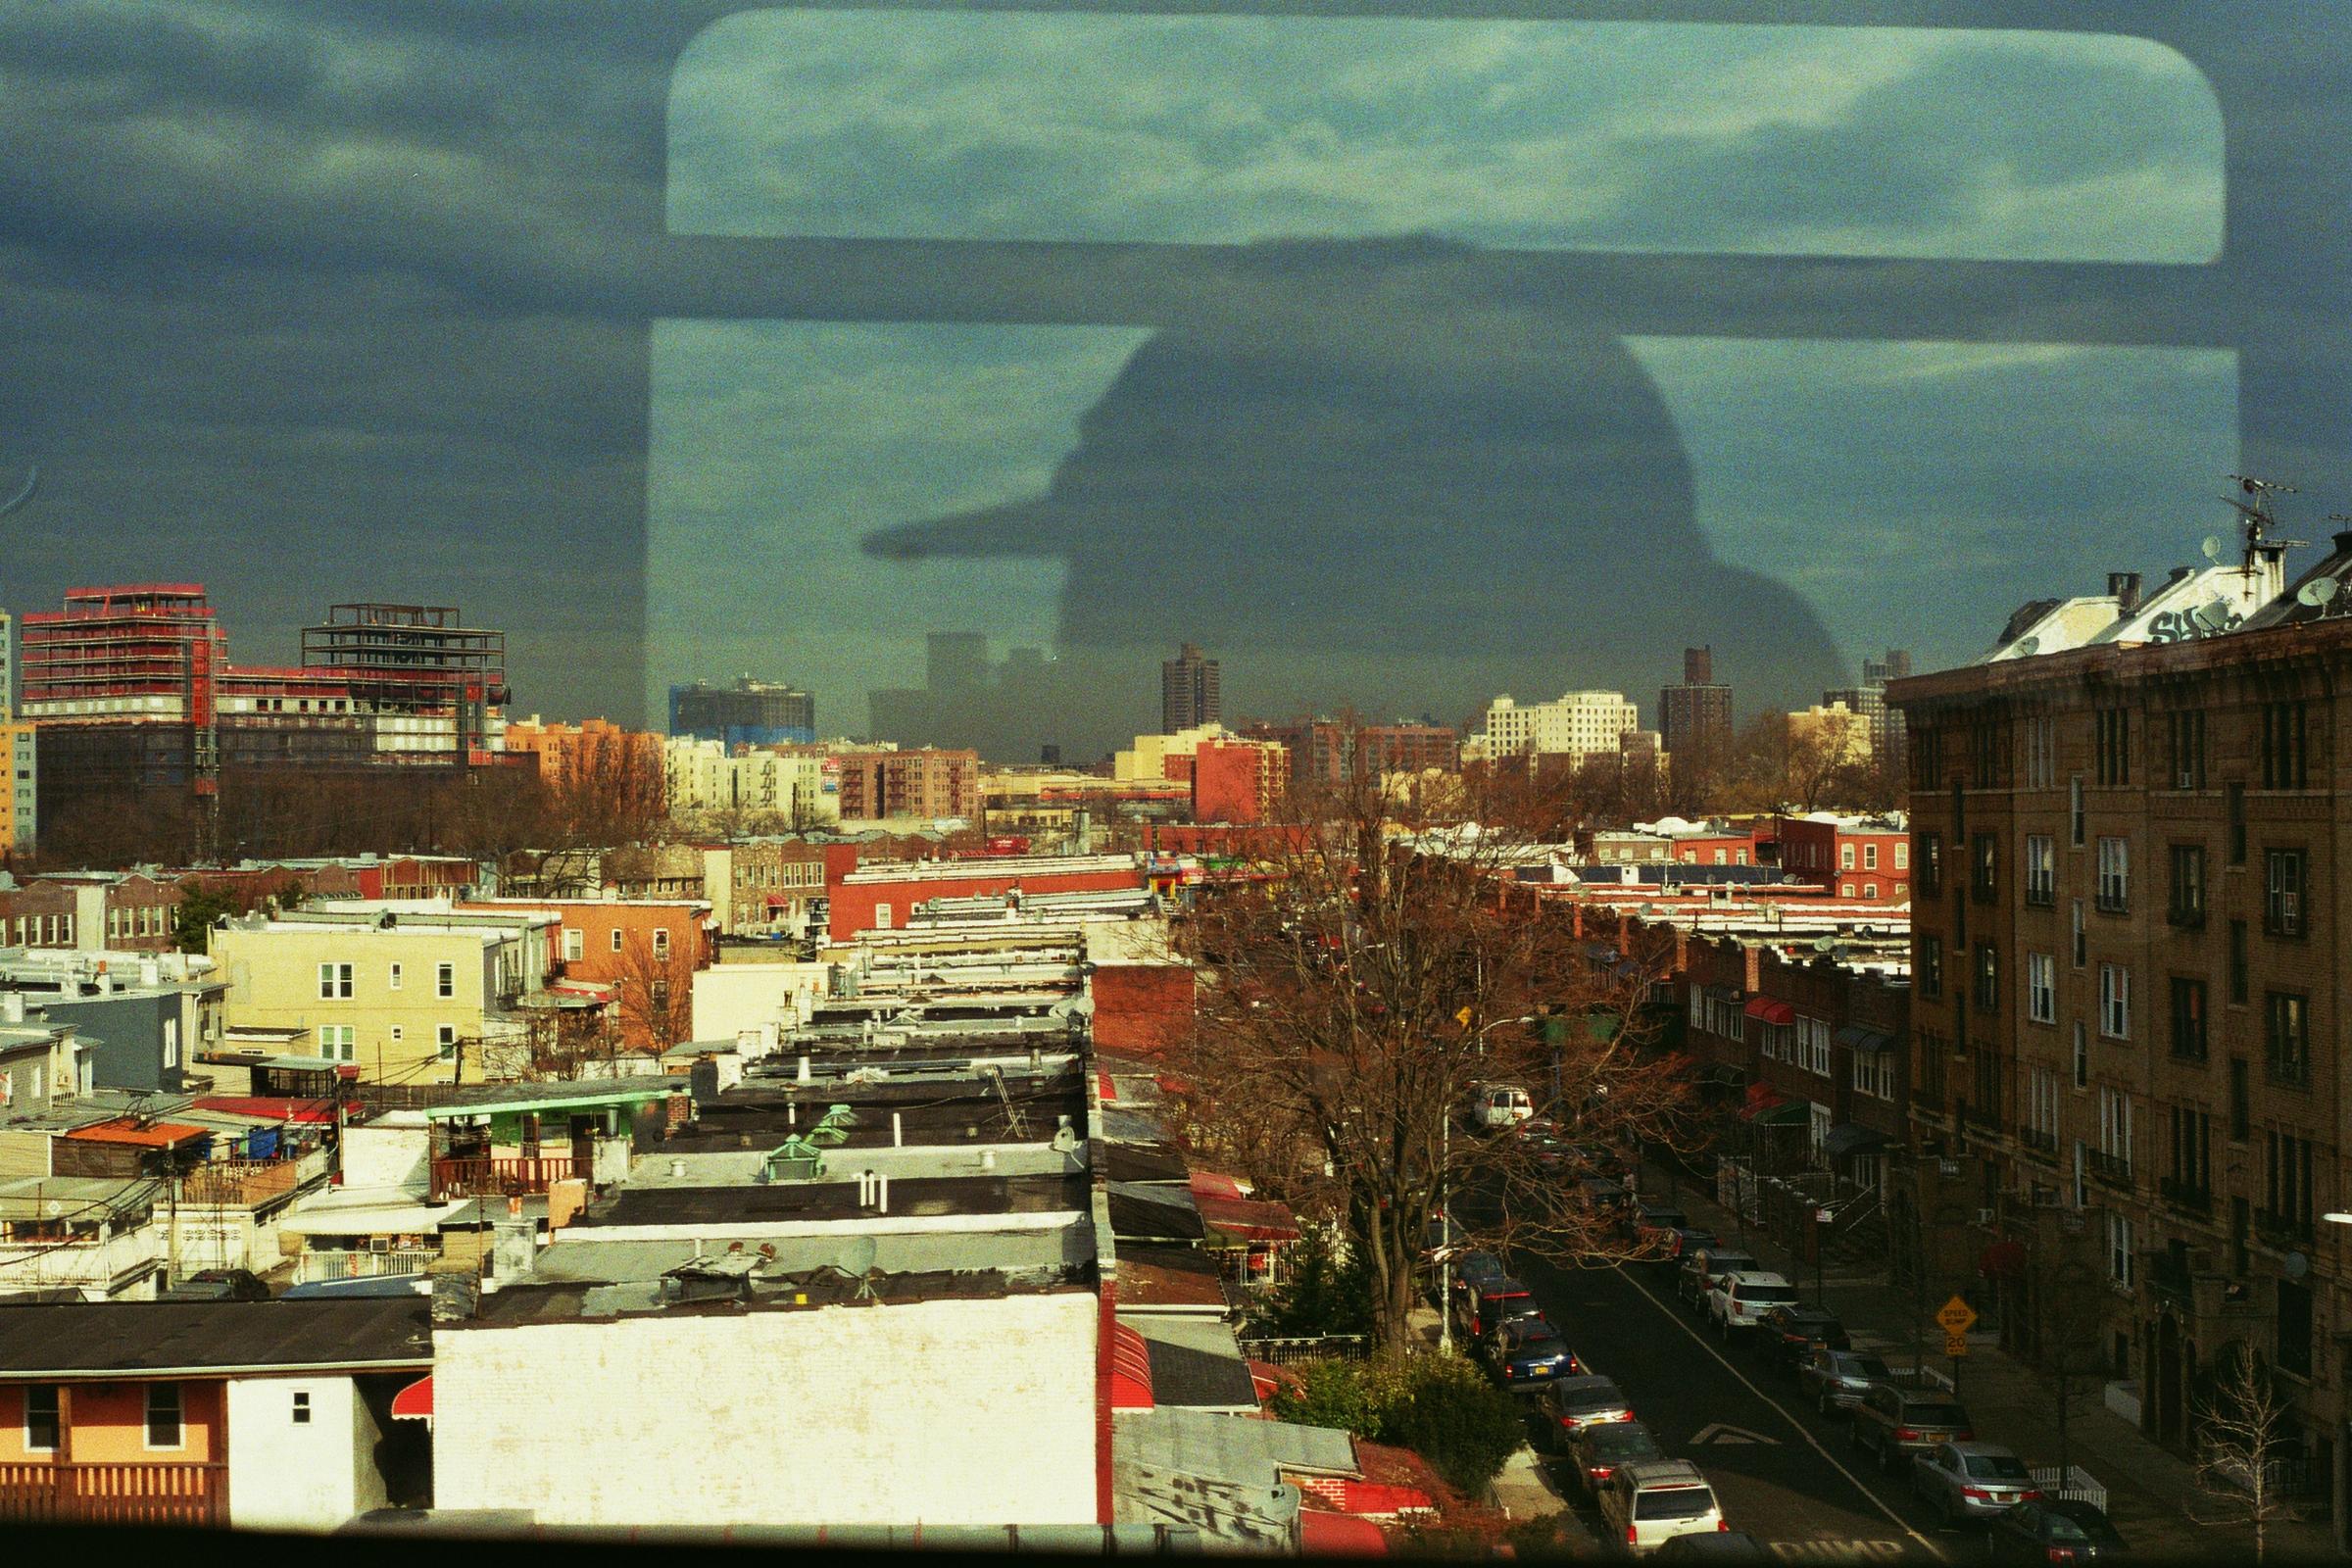 Foxhurst, The Bronx.  Kodak Ultra Max 400. Pentax K1000. Fletcher Berryman 2019.